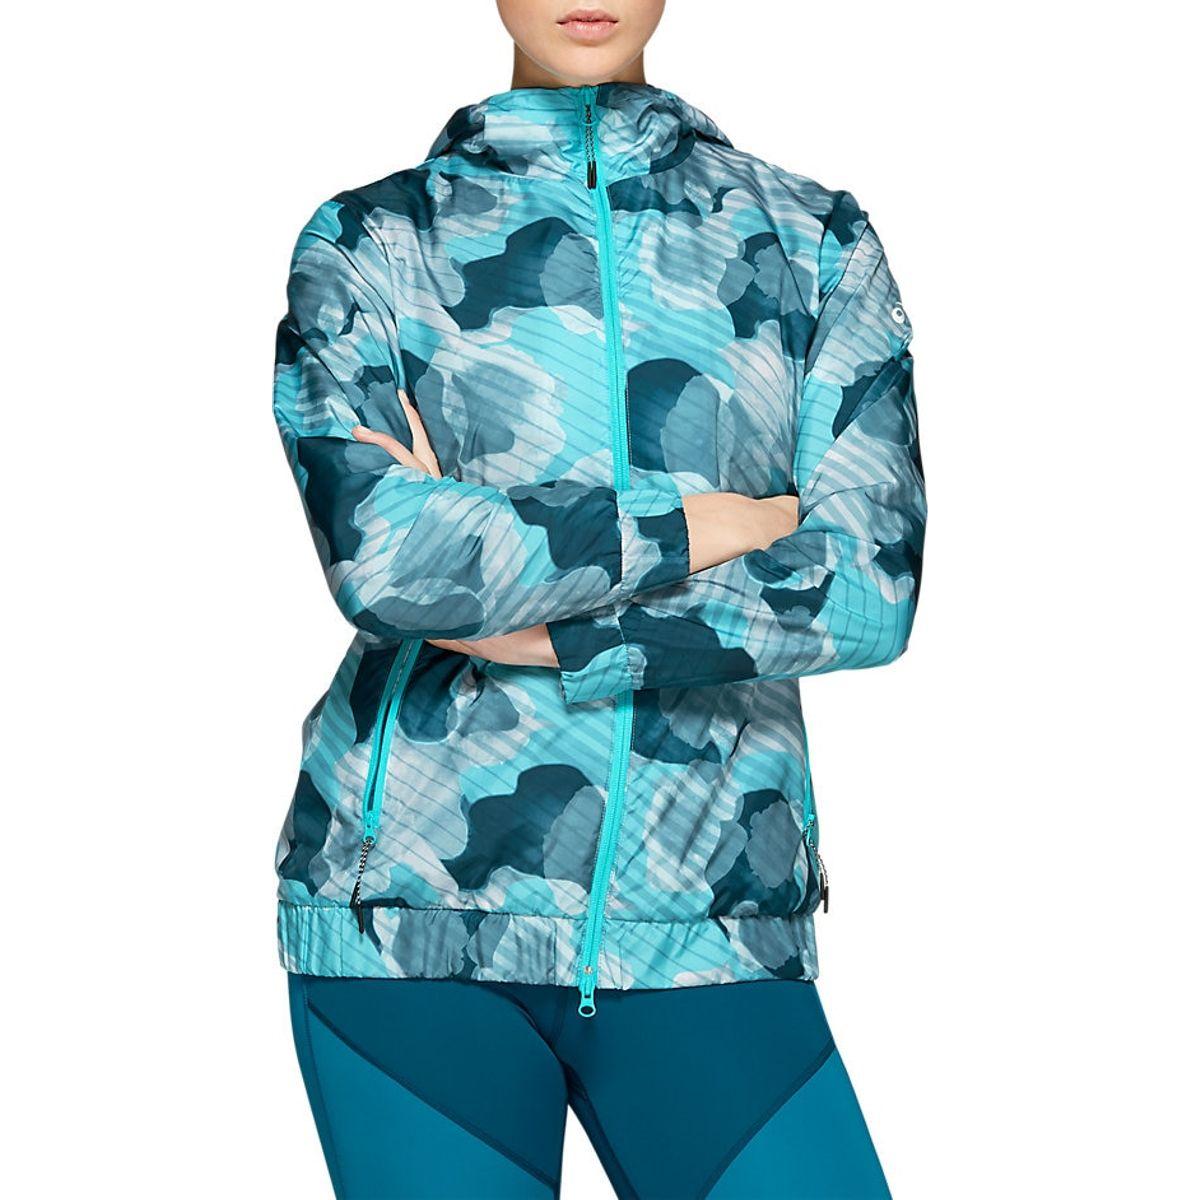 Jaqueta-Asics-Woven-GPX-Full-Zip---Feminino---Azul